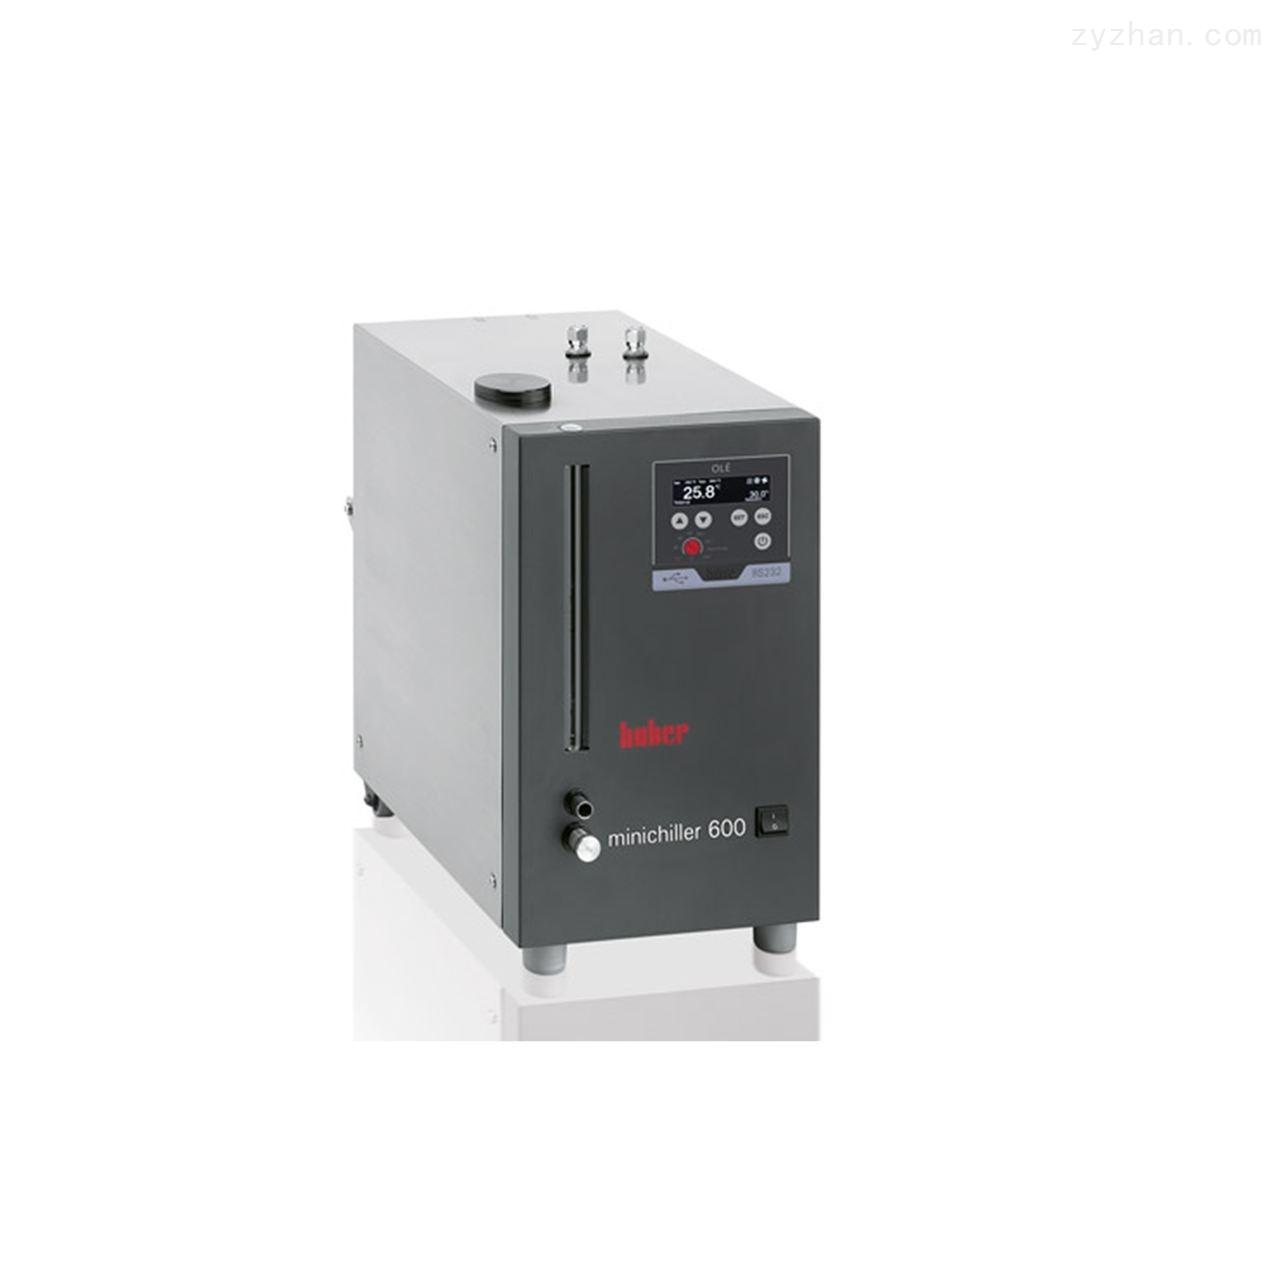 HUBER循环制冷器Minichiller 600 OLÉ